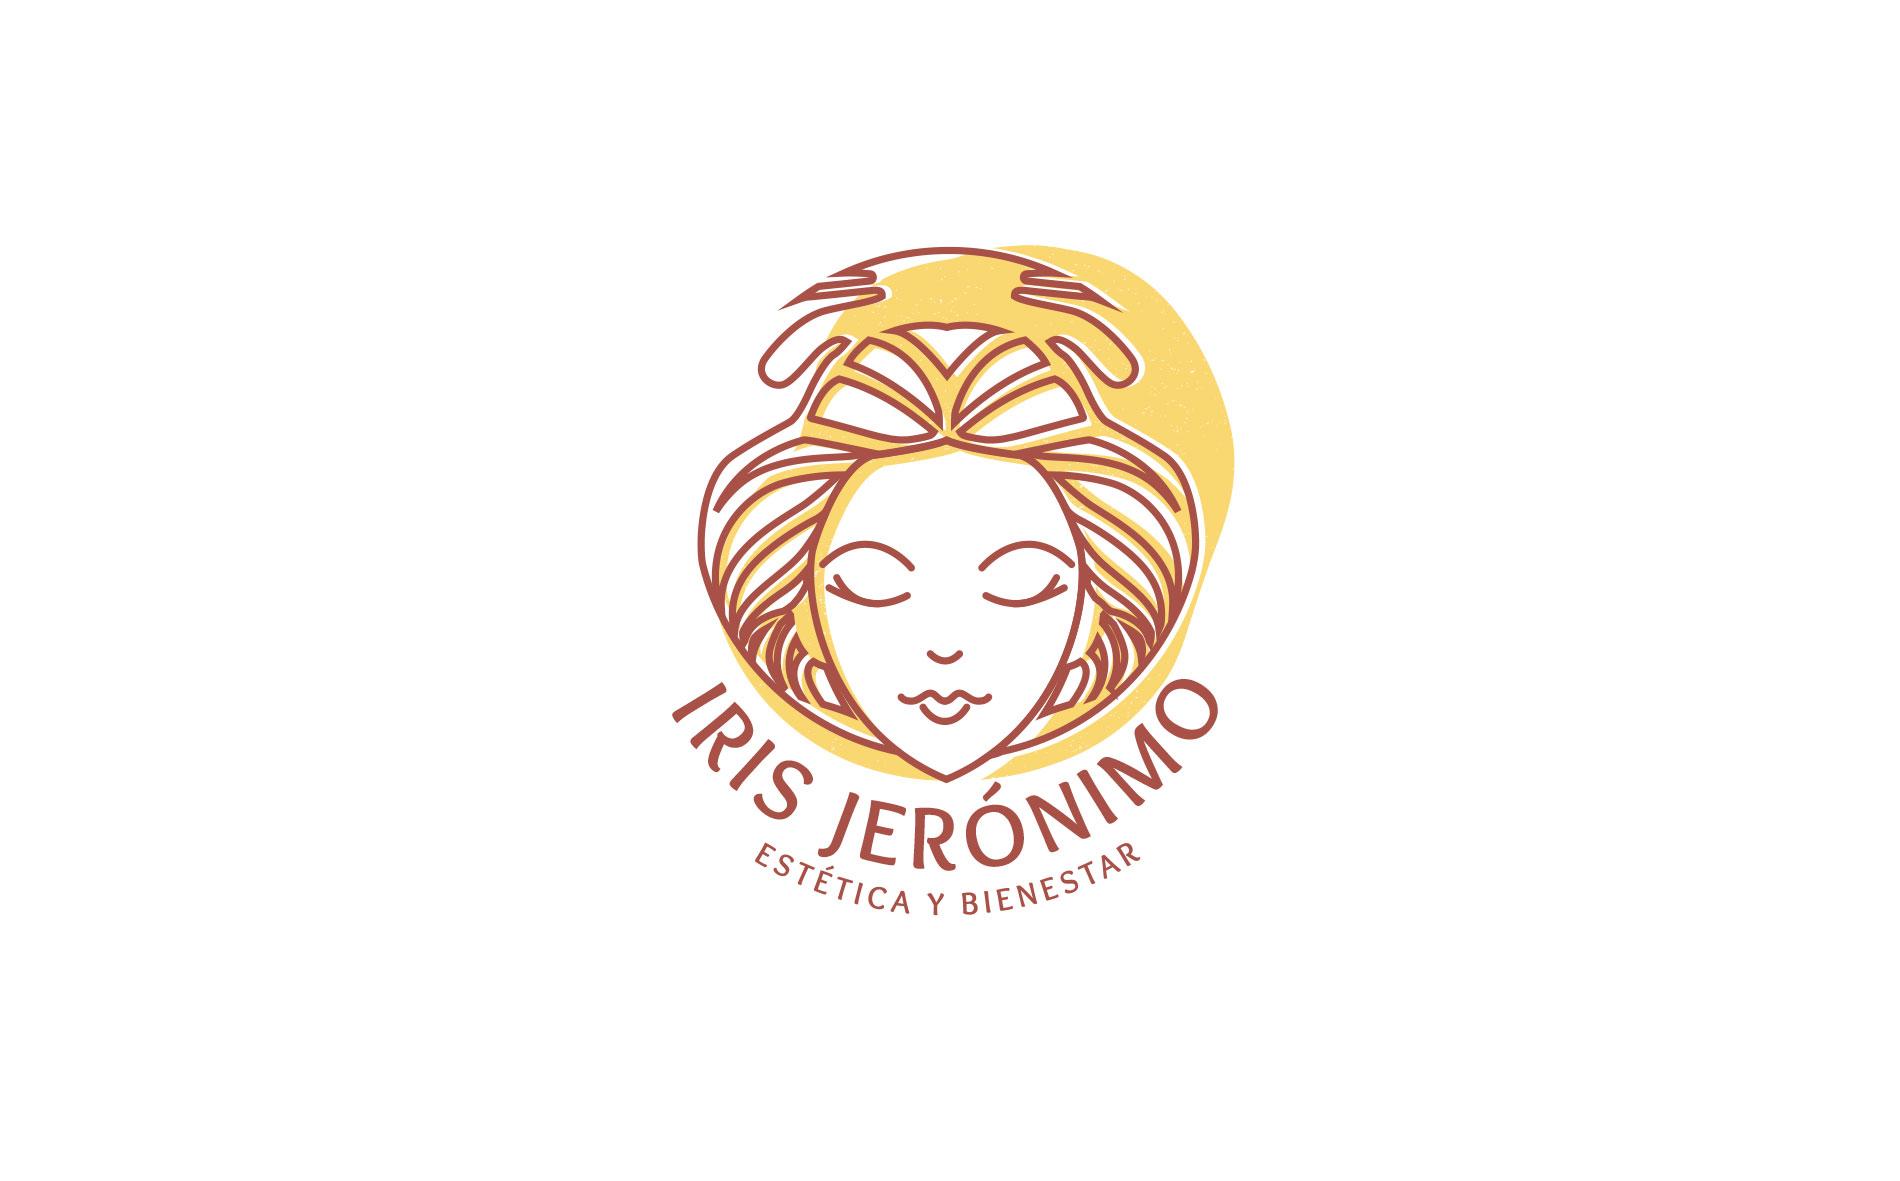 Iris Jerónimo - Diseño de Marca 1